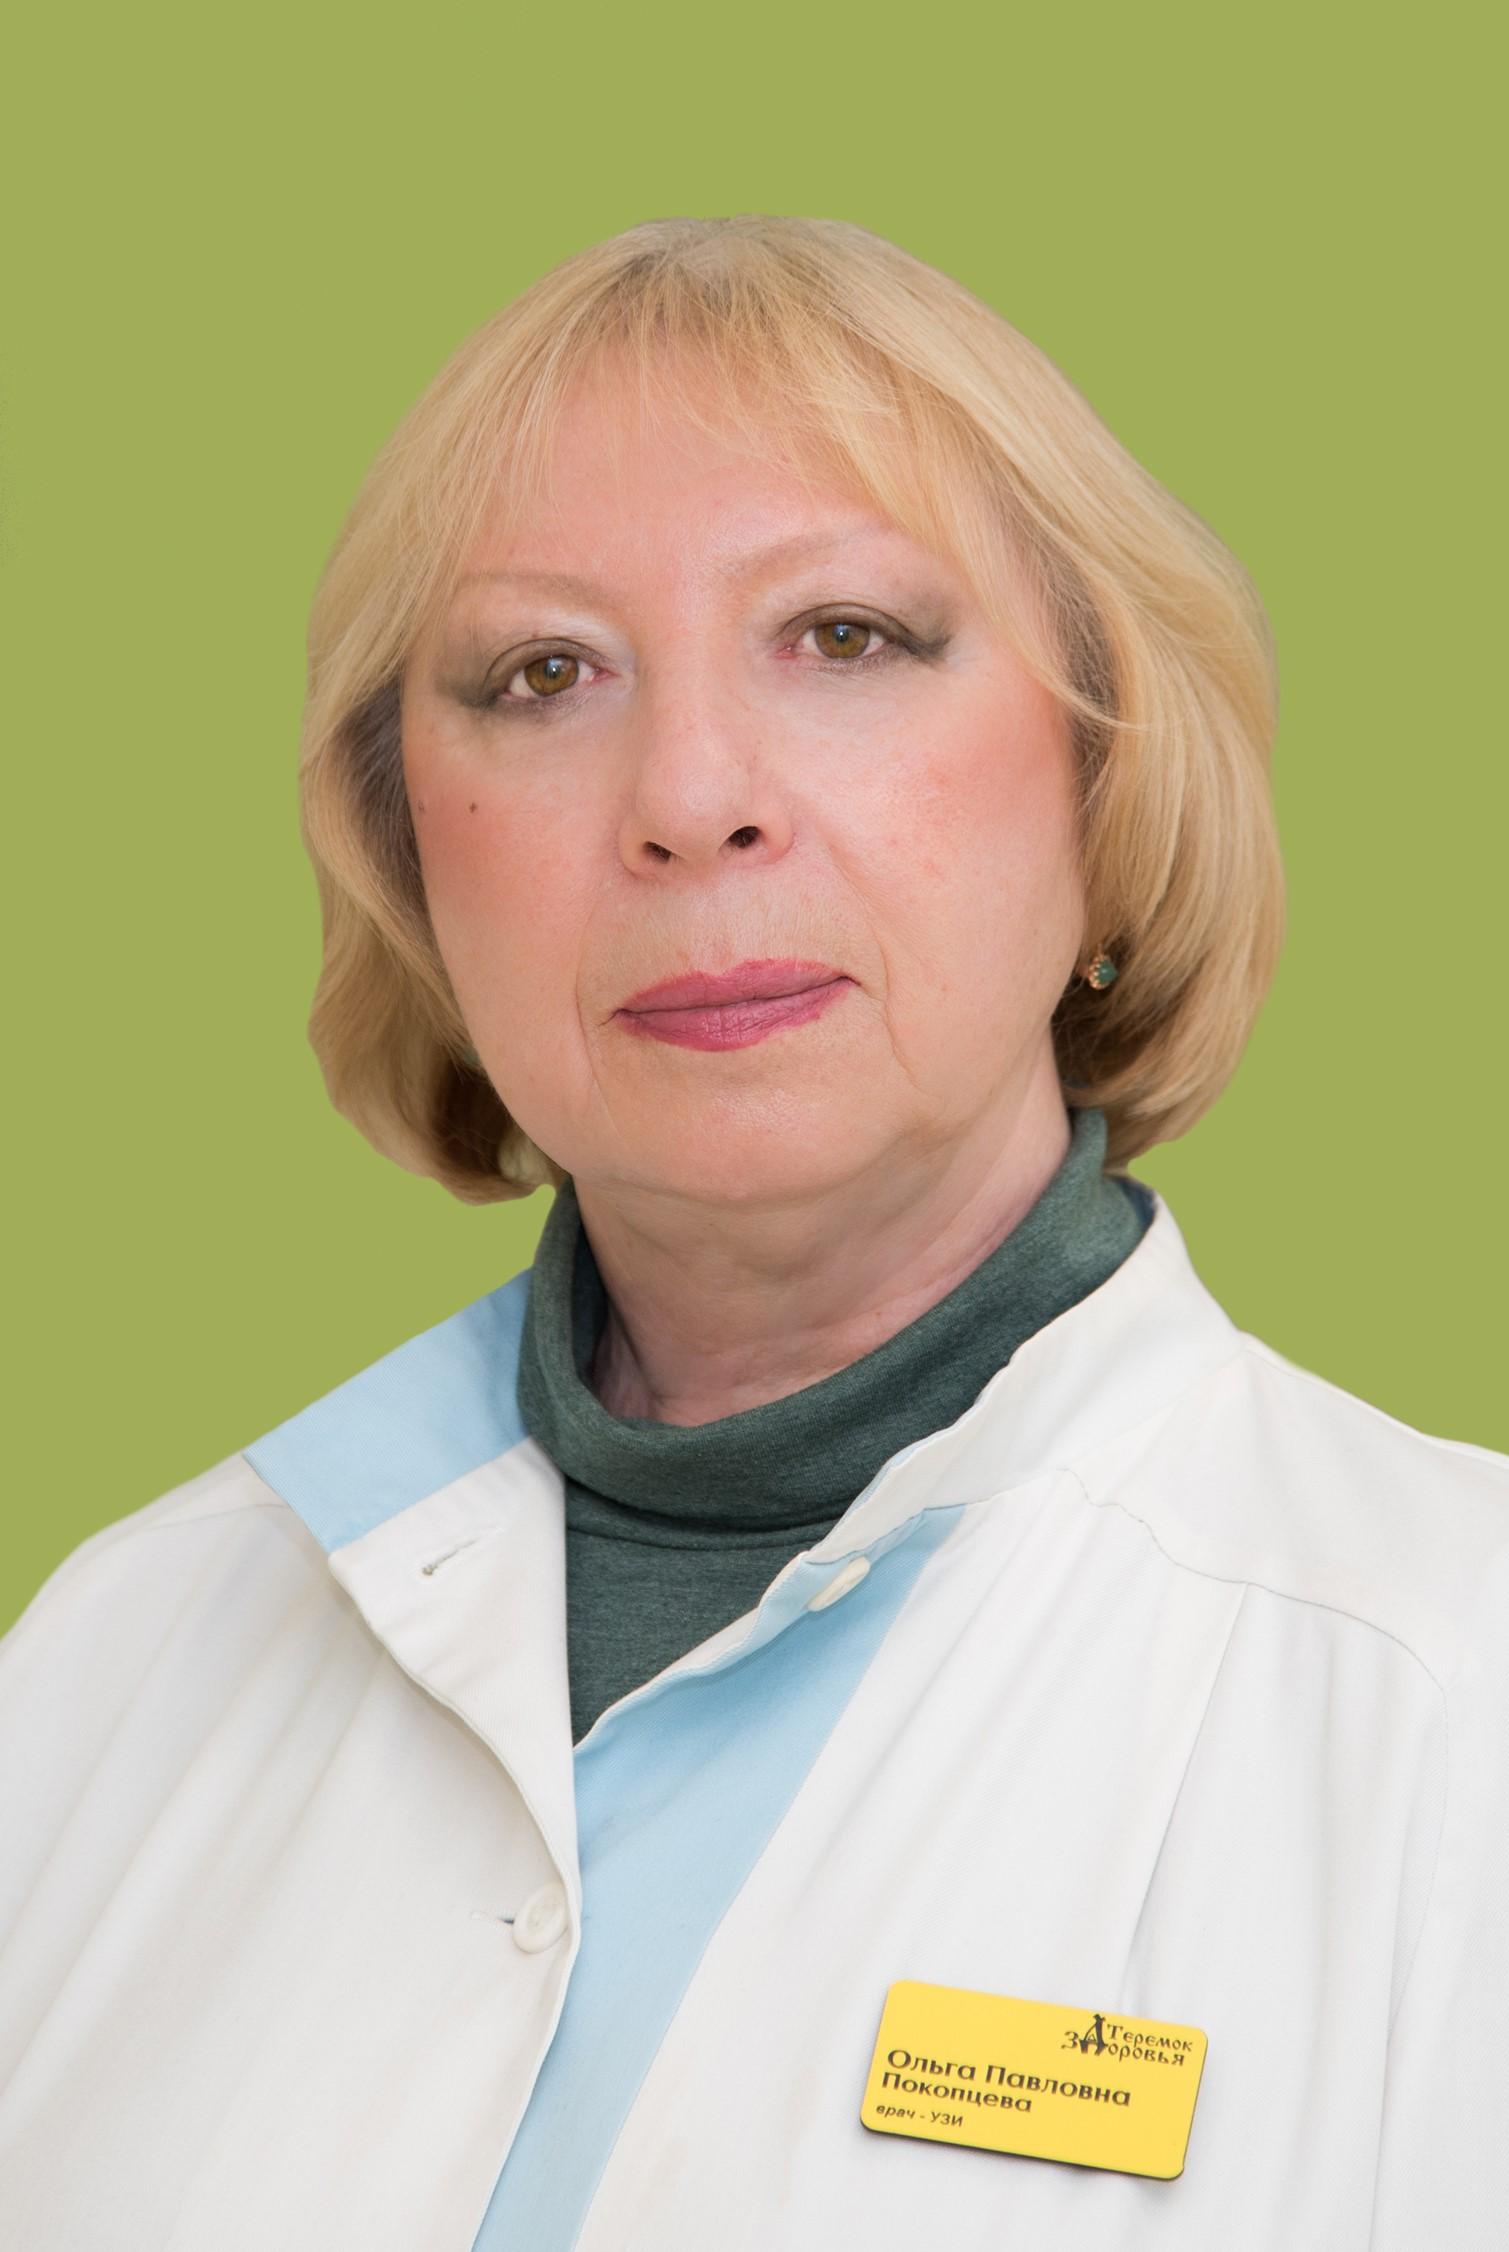 Покопцева О. П.